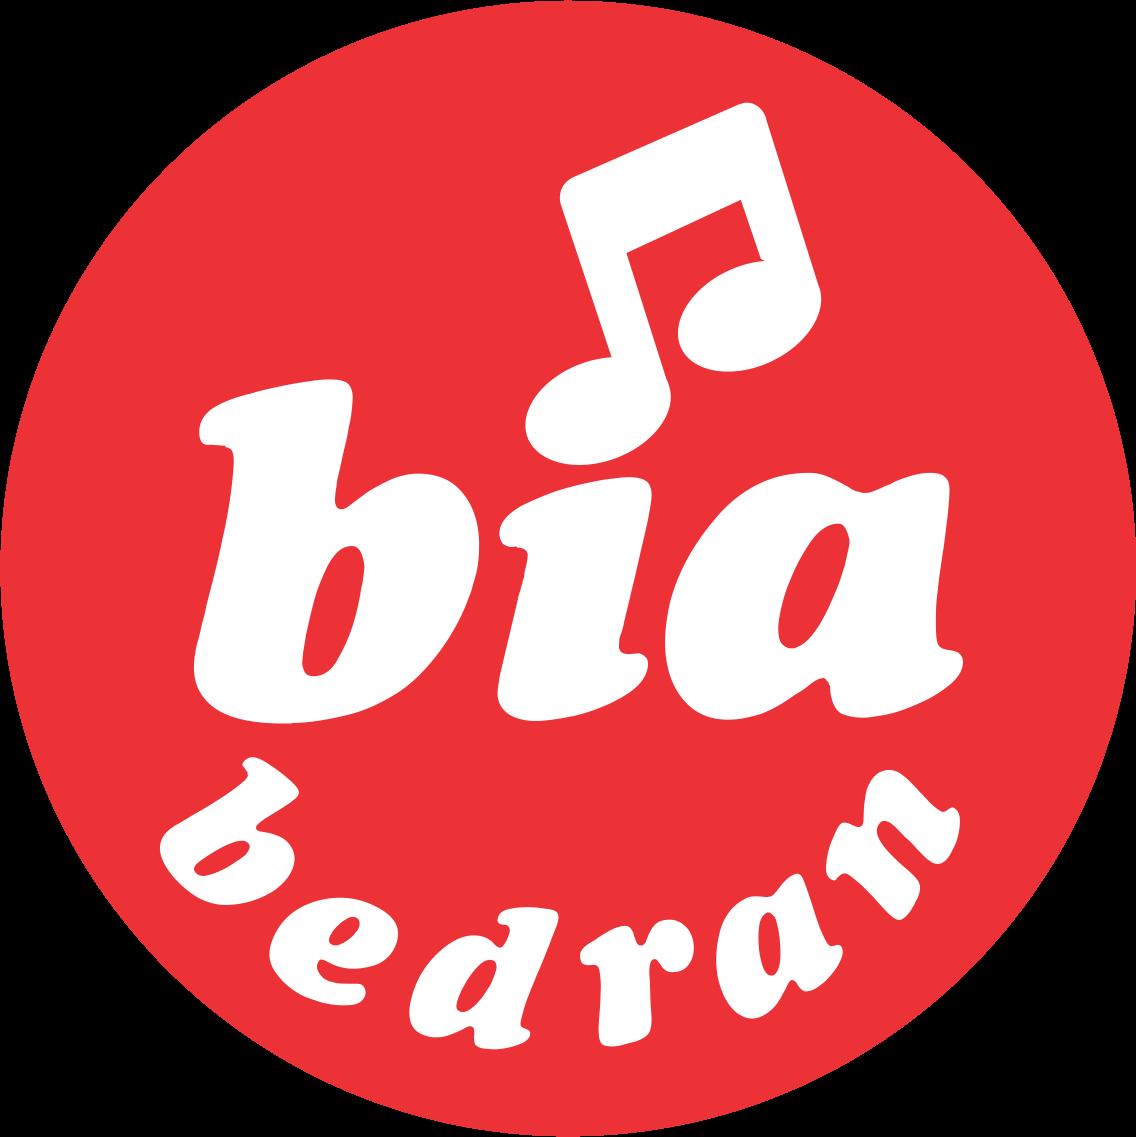 Logo Bia Bedran